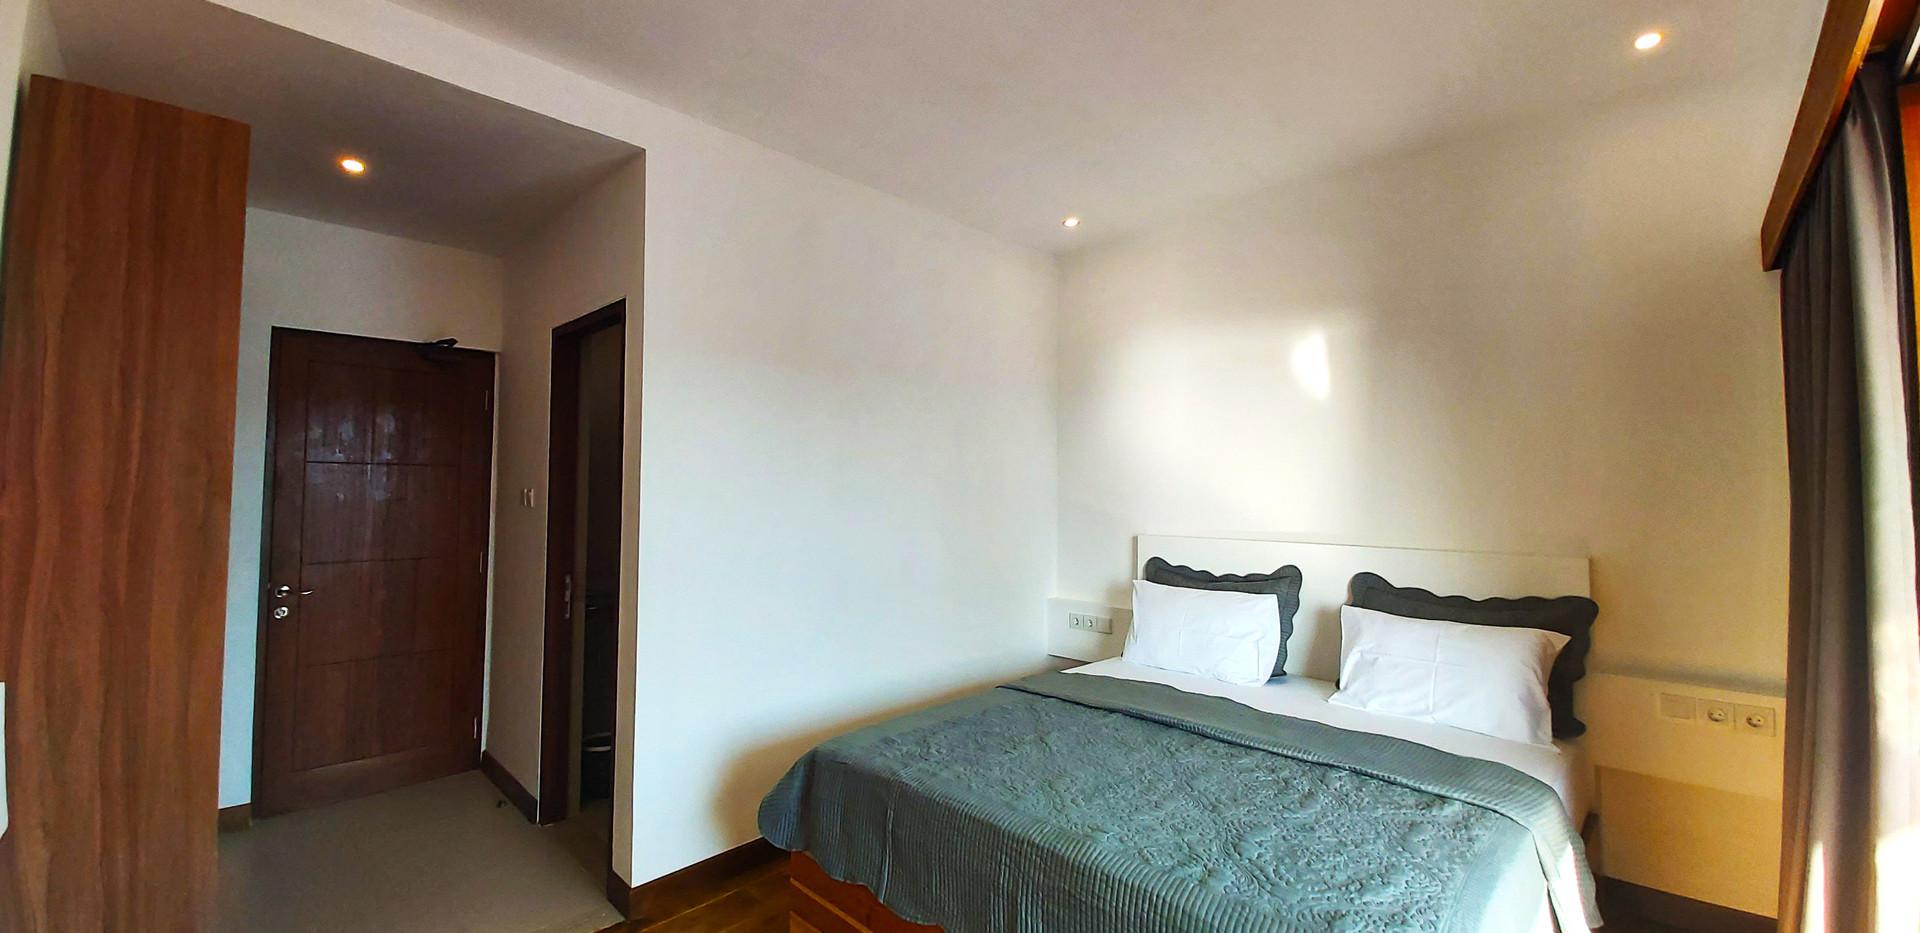 Marina Del Ray Bedroom 2.jpg